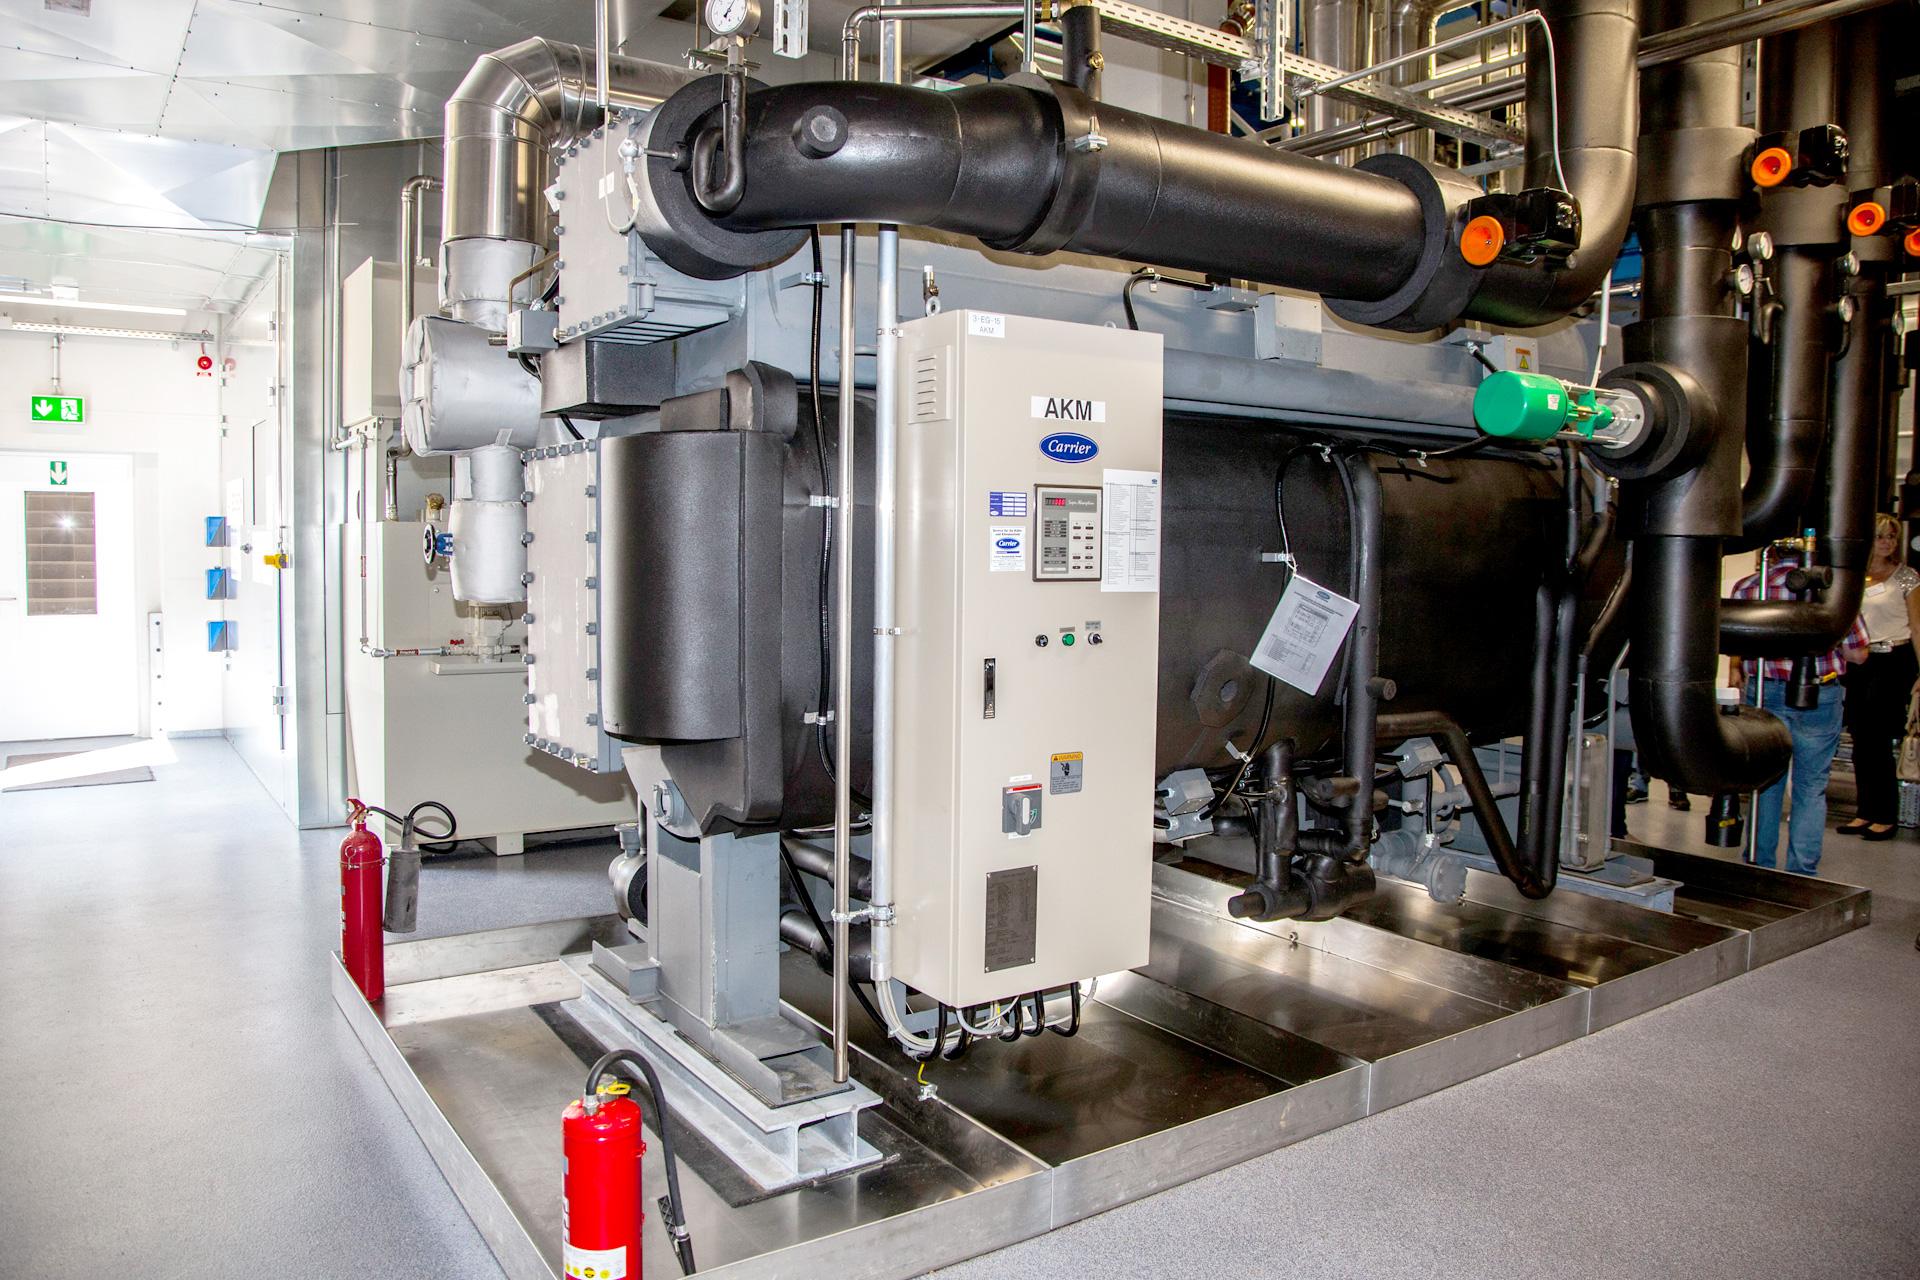 Referenzen, Kälteerzeugung, Absorptionskältemaschine